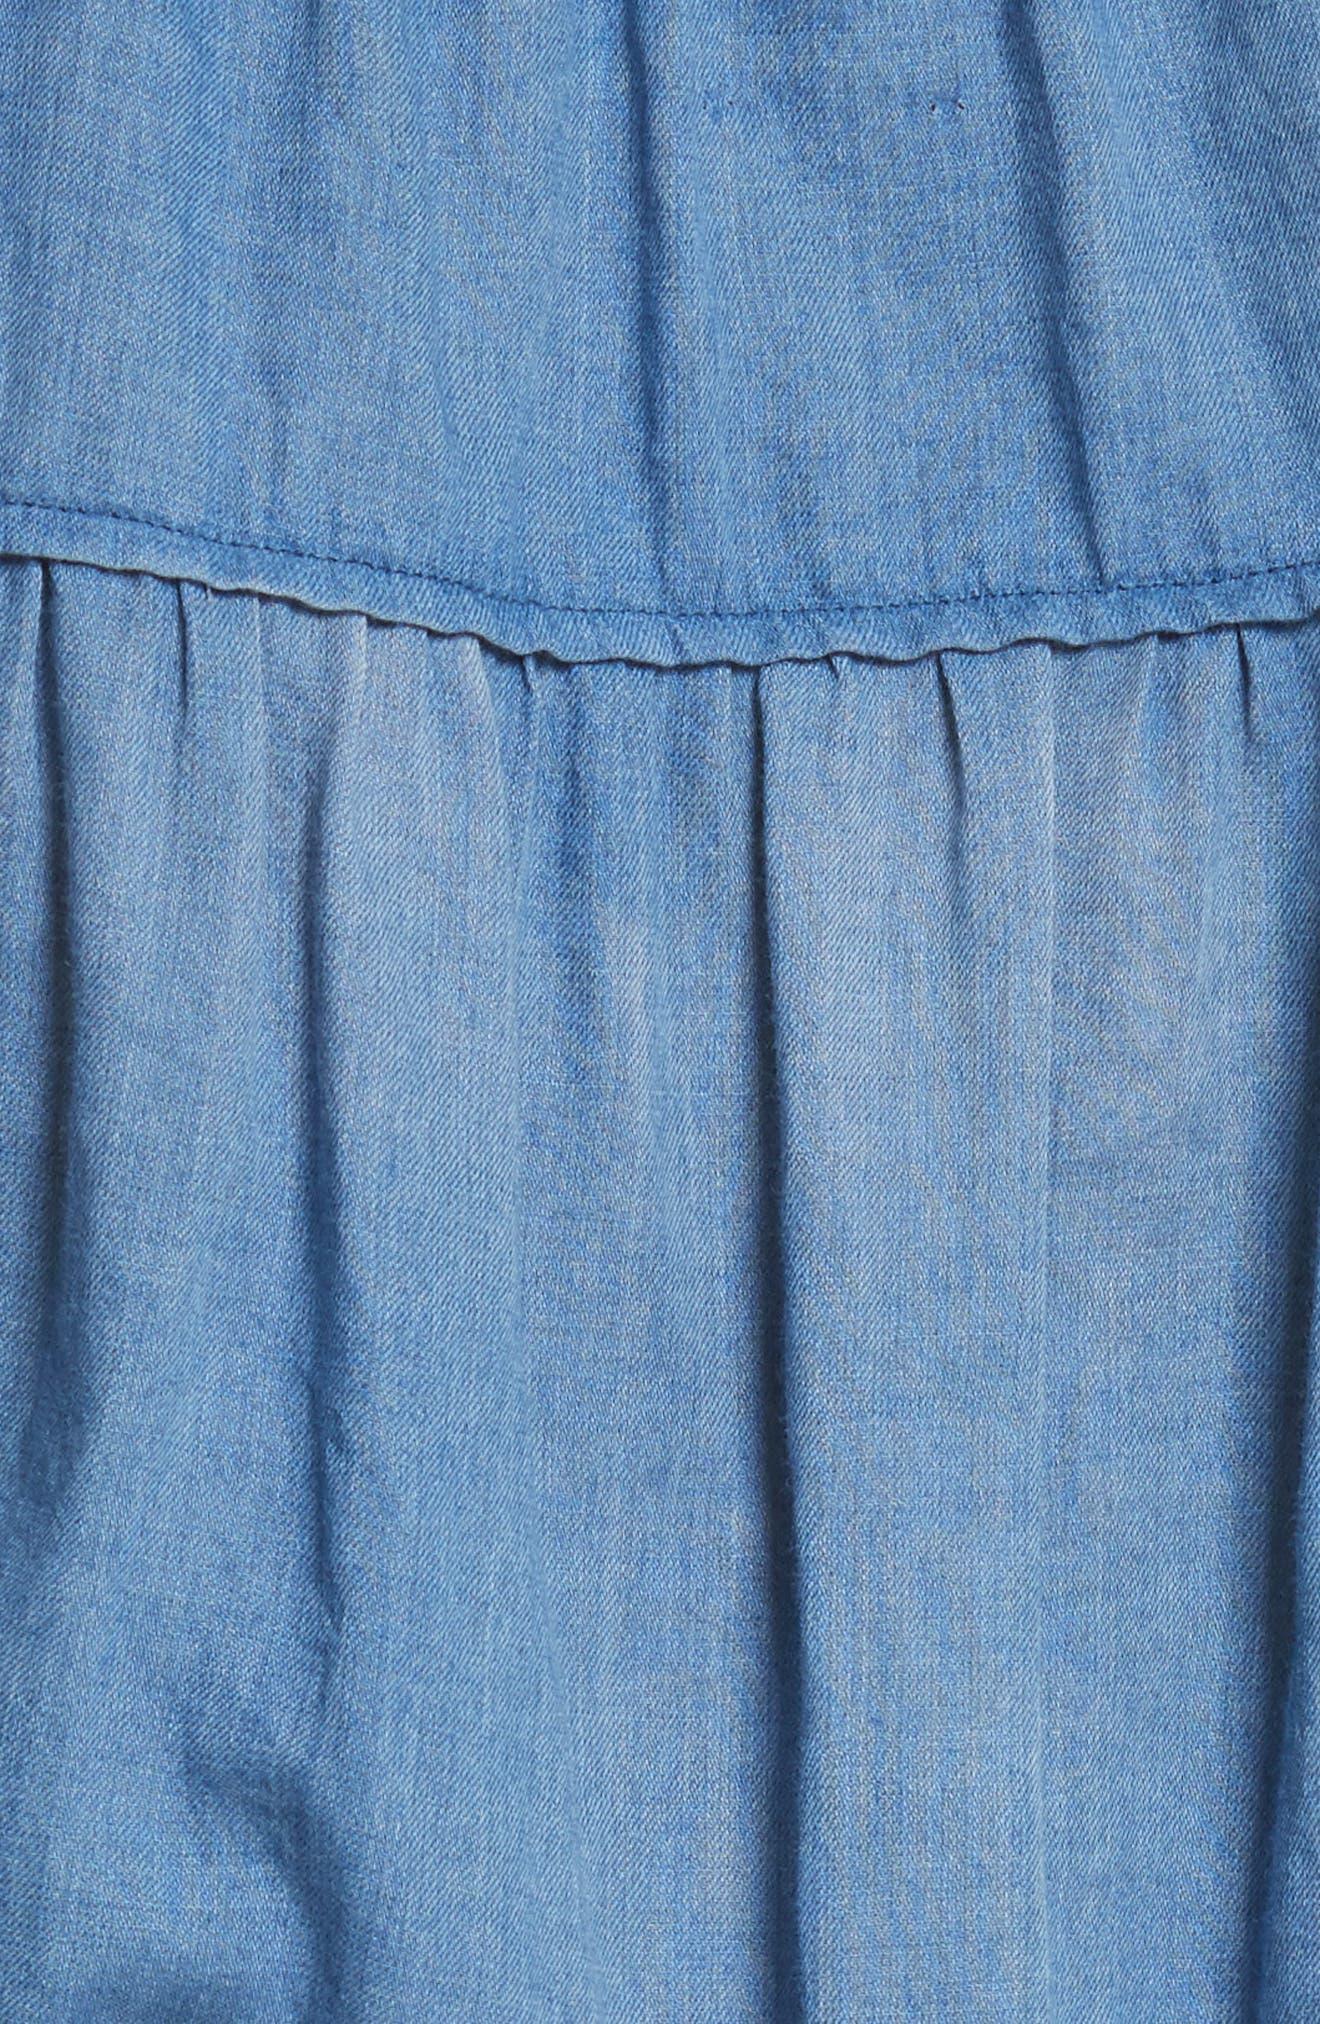 Ruffle Tissue Denim Dress,                             Alternate thumbnail 5, color,                             453